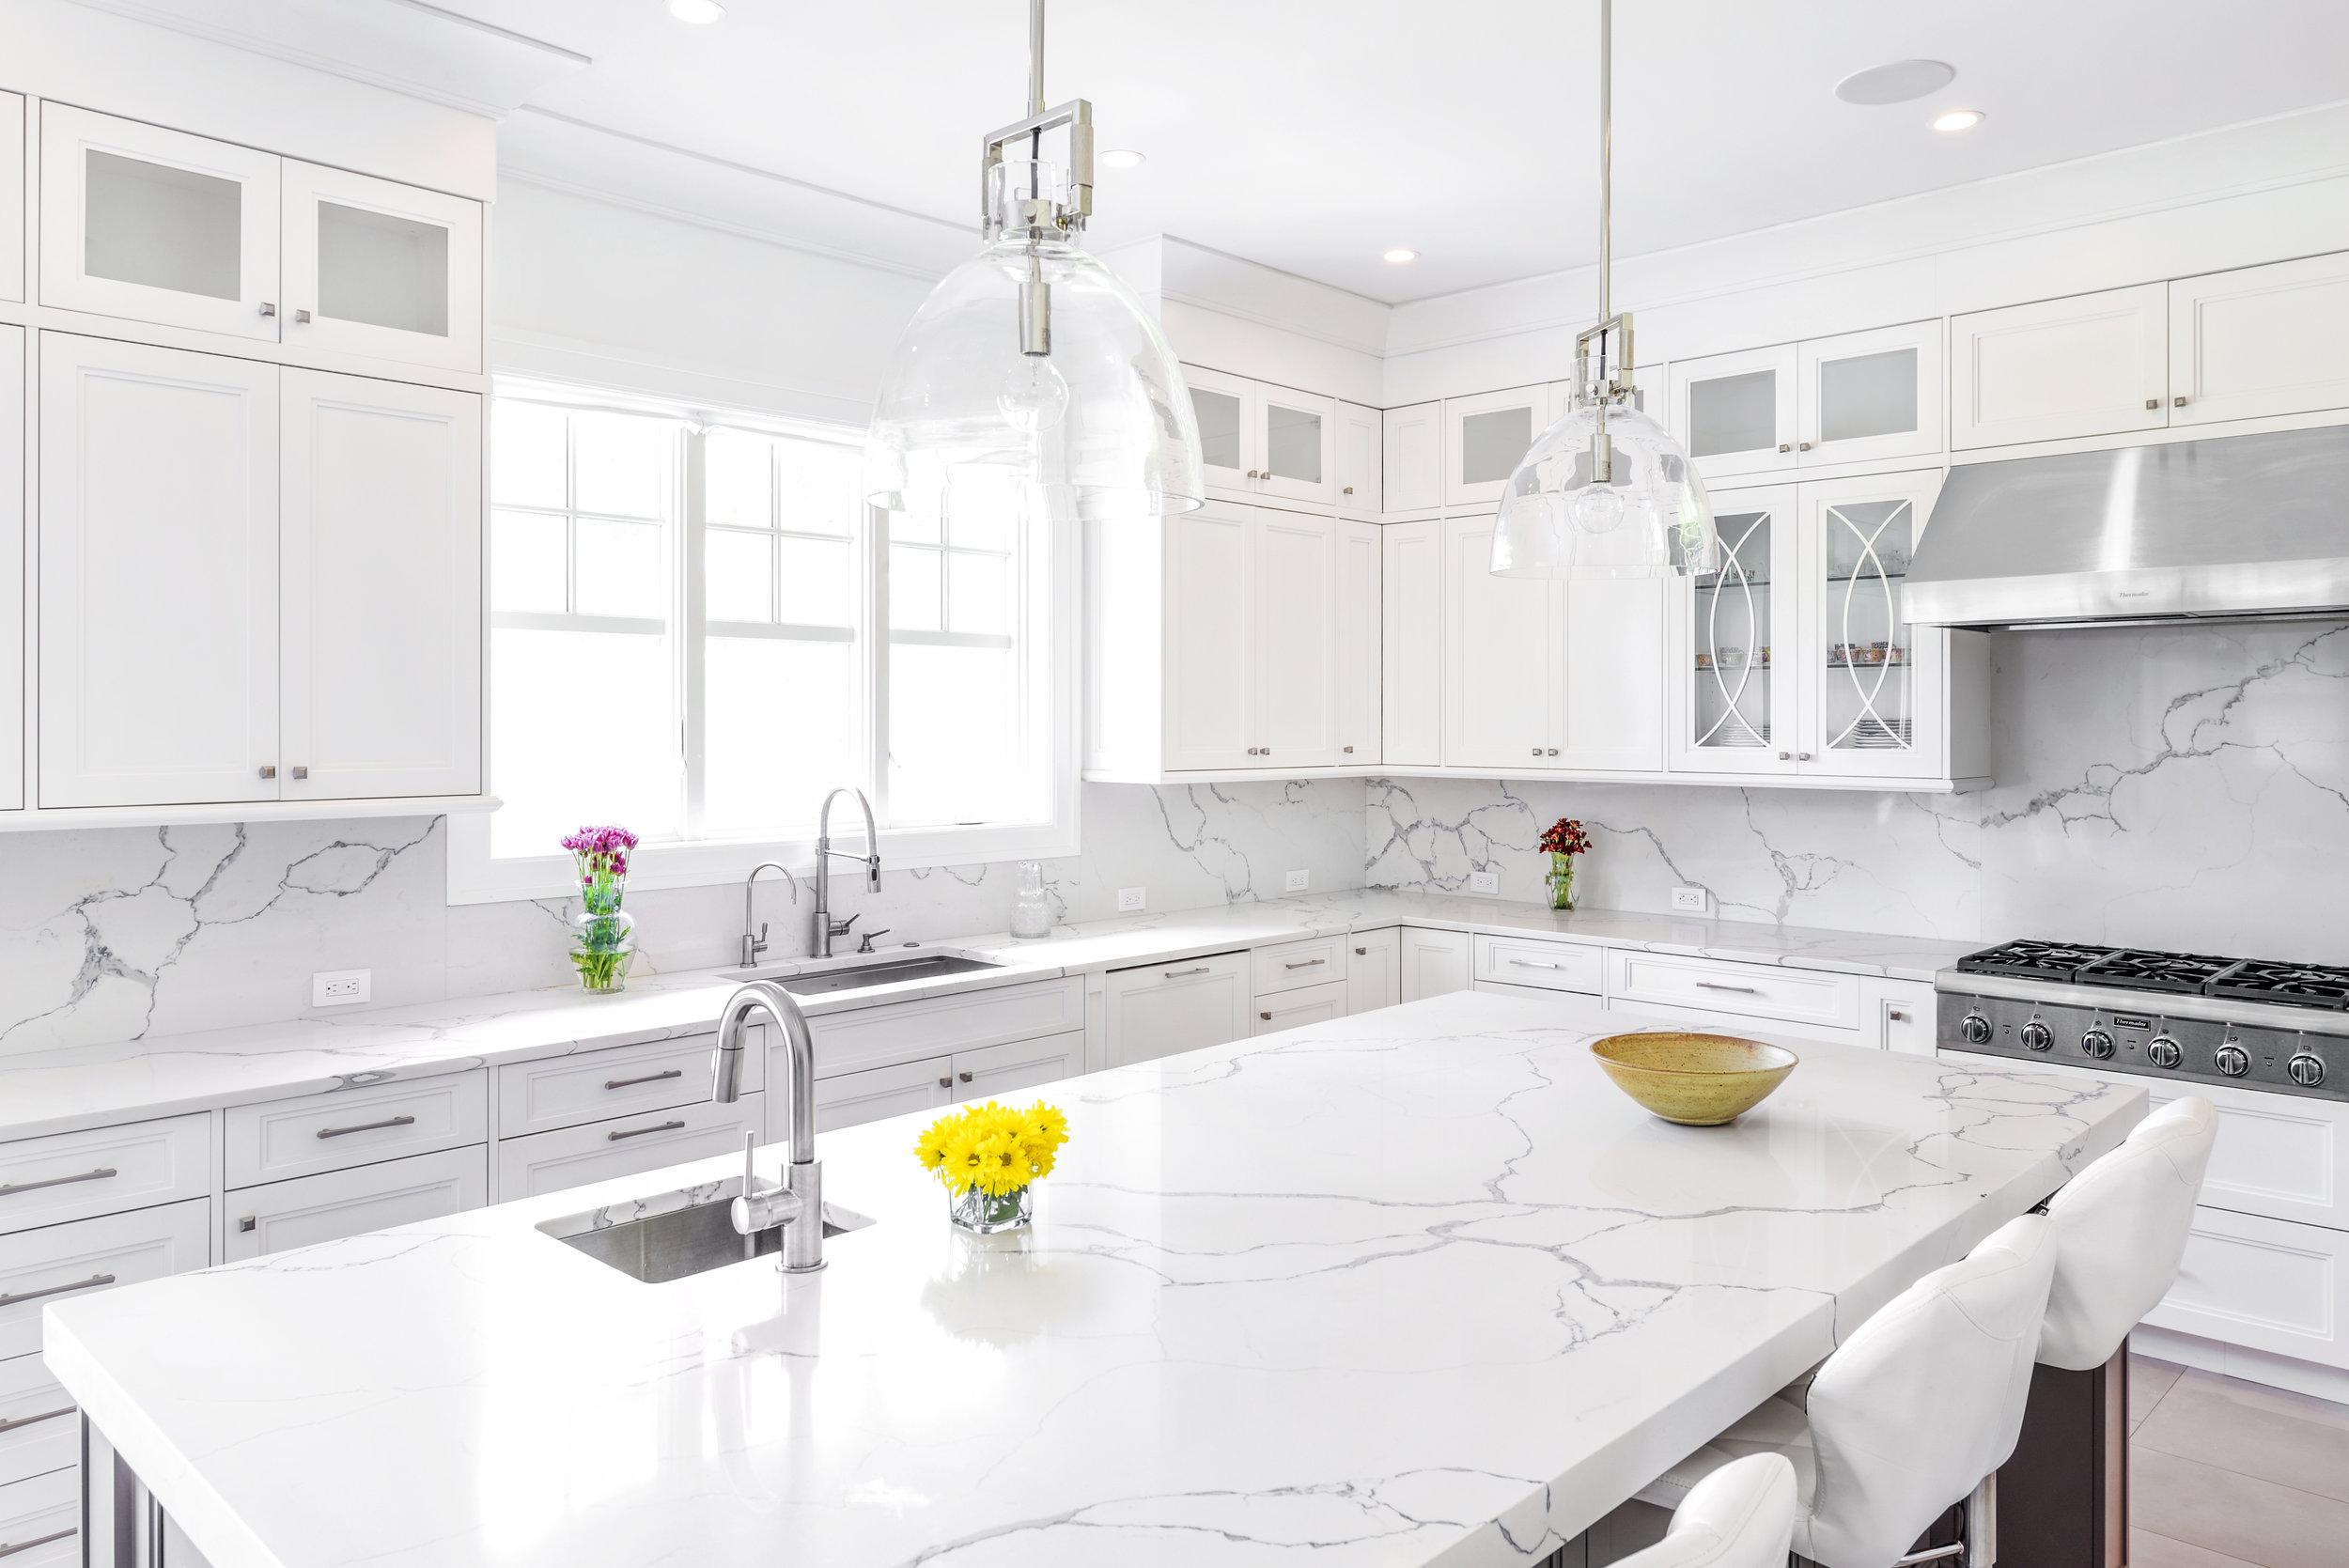 Prestige Custom Kitchen - AHW_3217 - photo by Andrew Werner.jpg